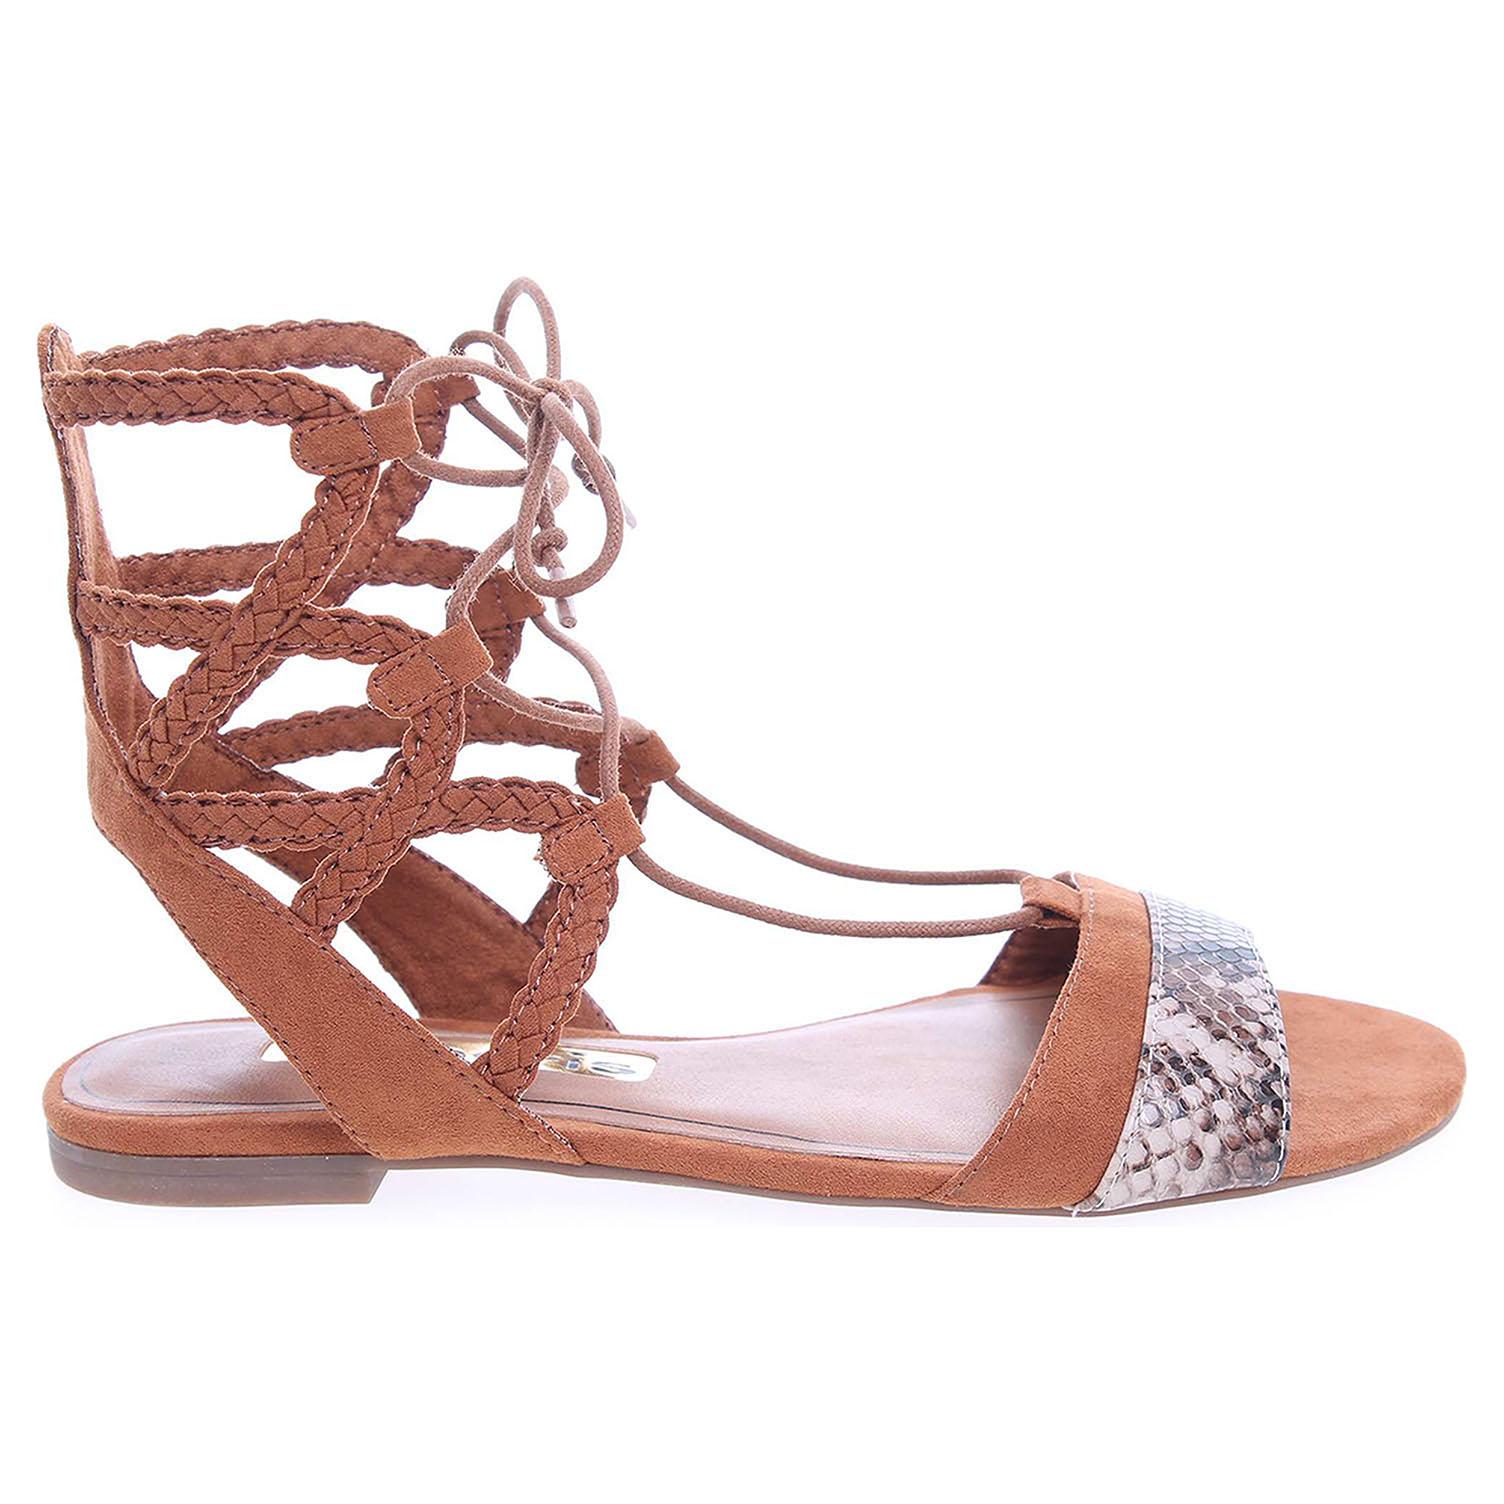 Ecco Tamaris dámské sandály 1-28178-36 hnědé 23801019